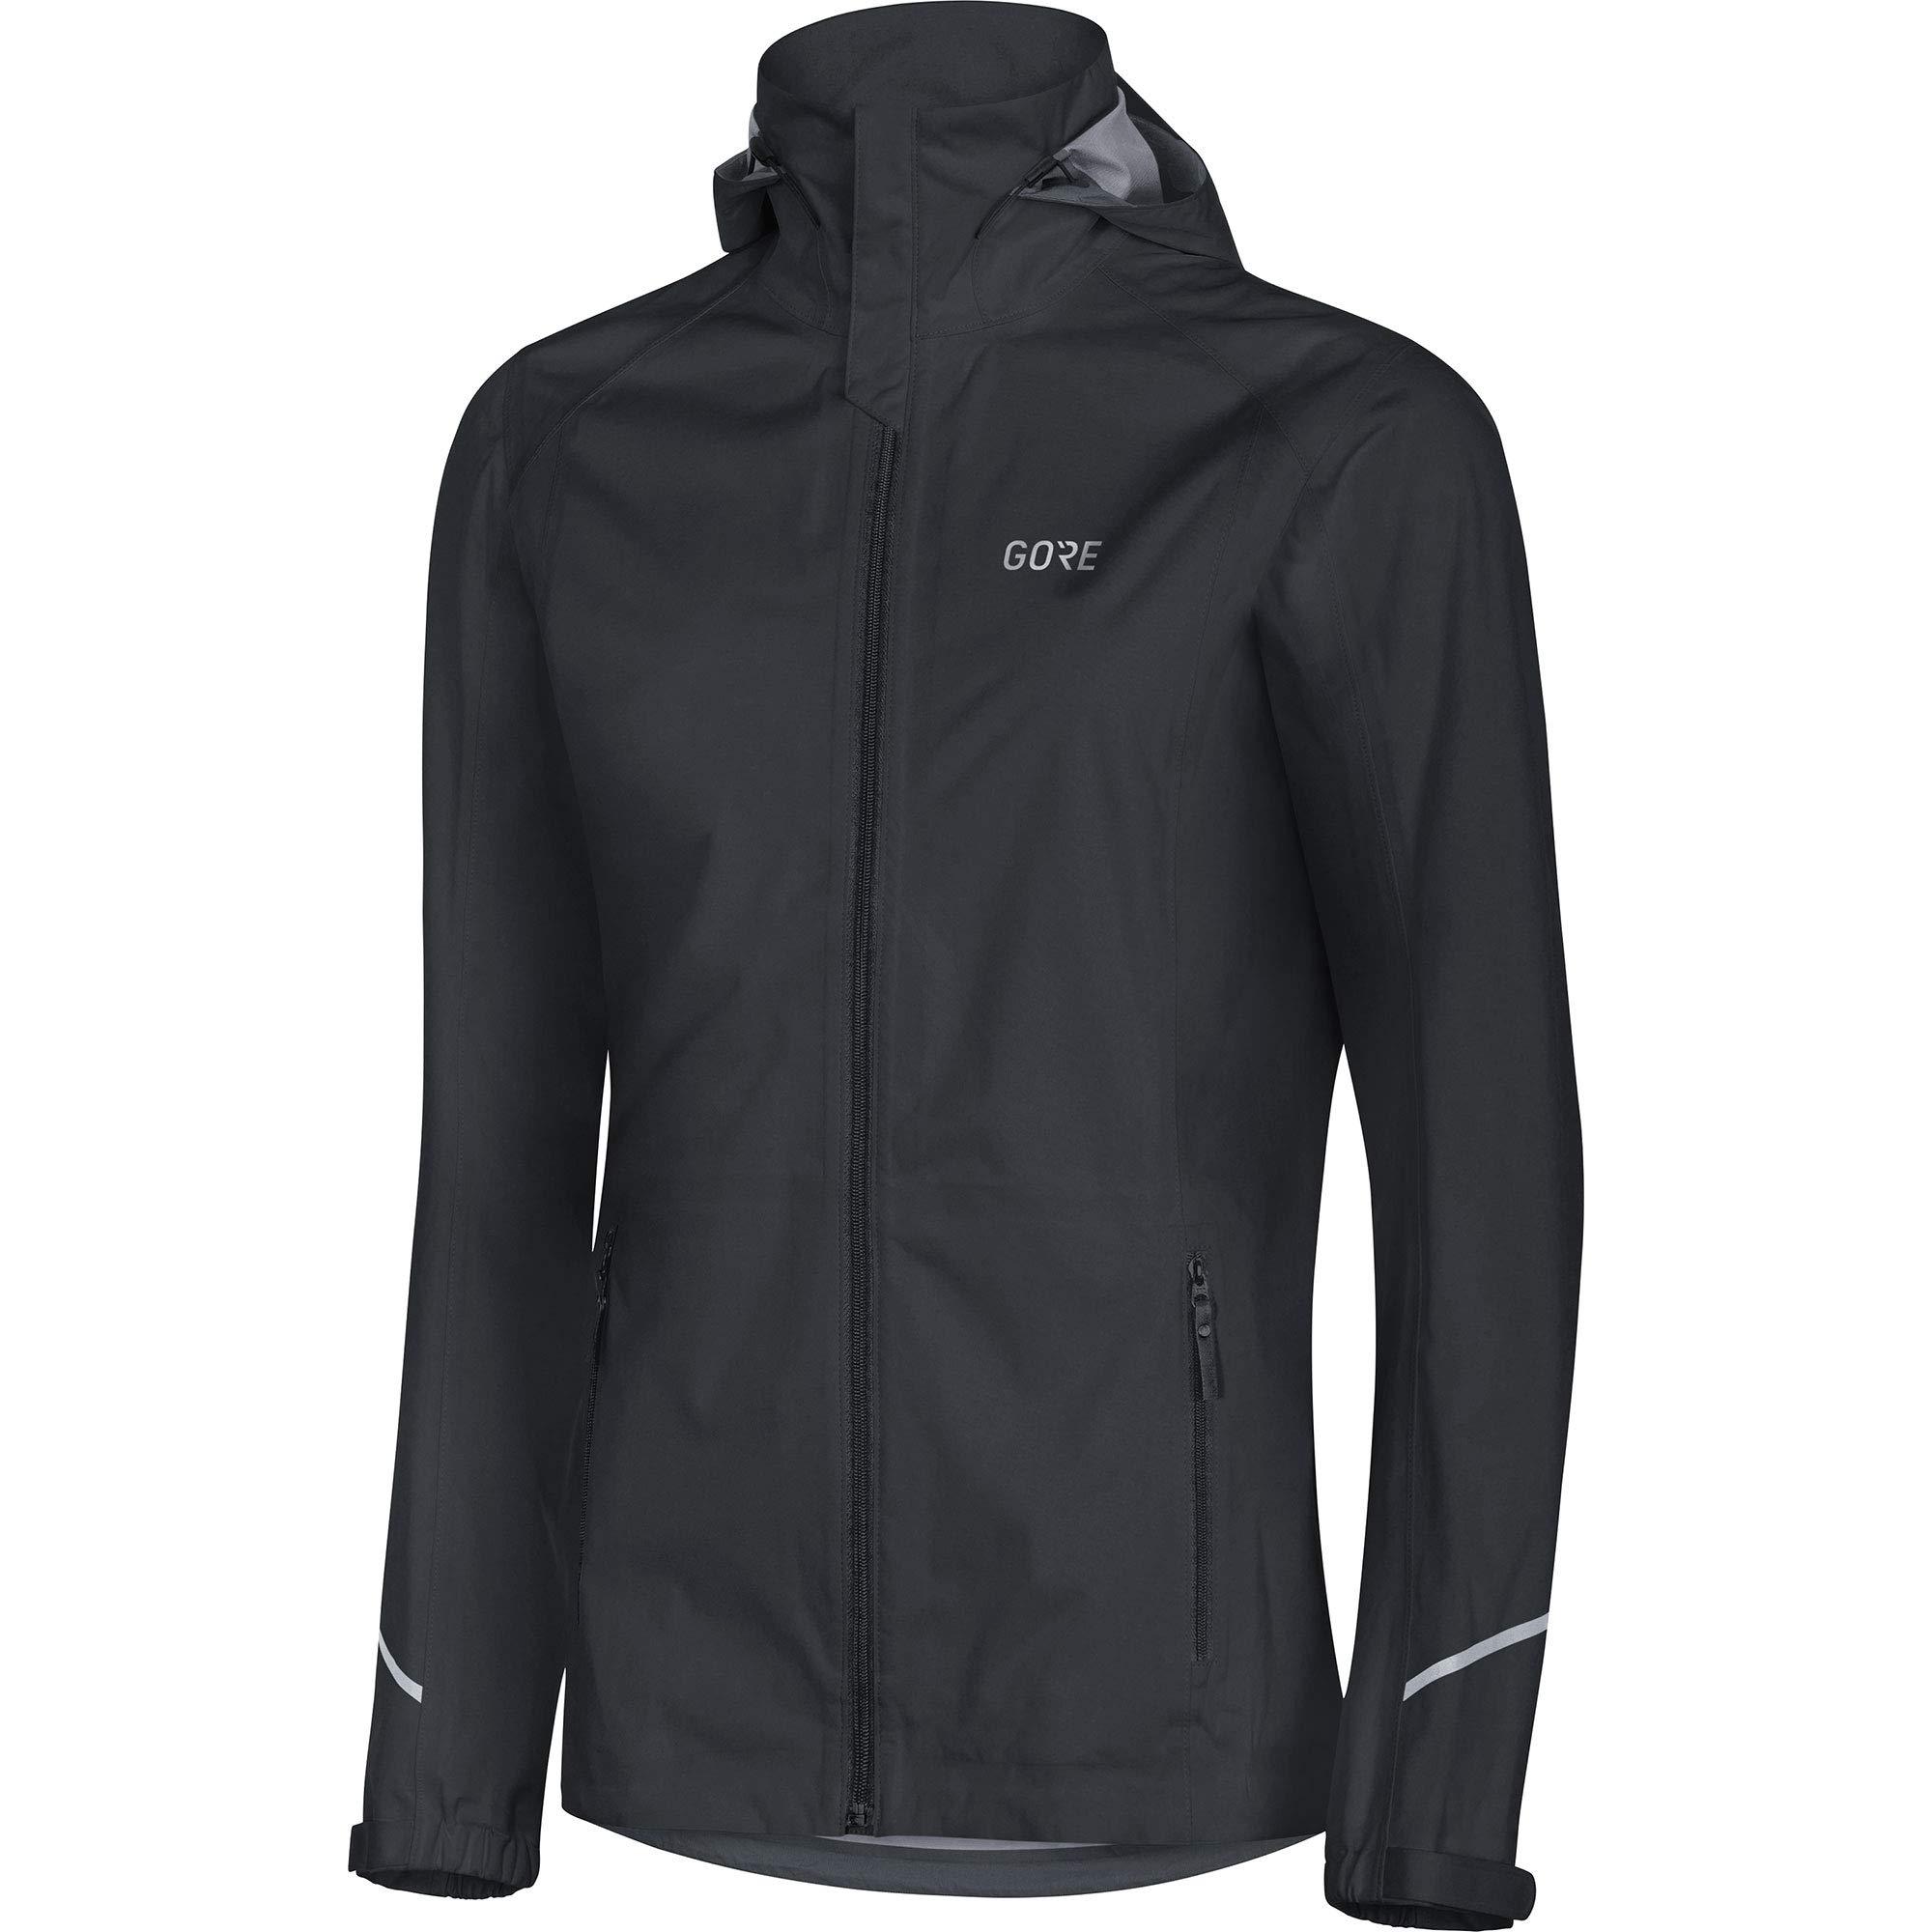 GORE Wear R3 Ladies Hooded Jacket GORE-TEX Active, XS, Black